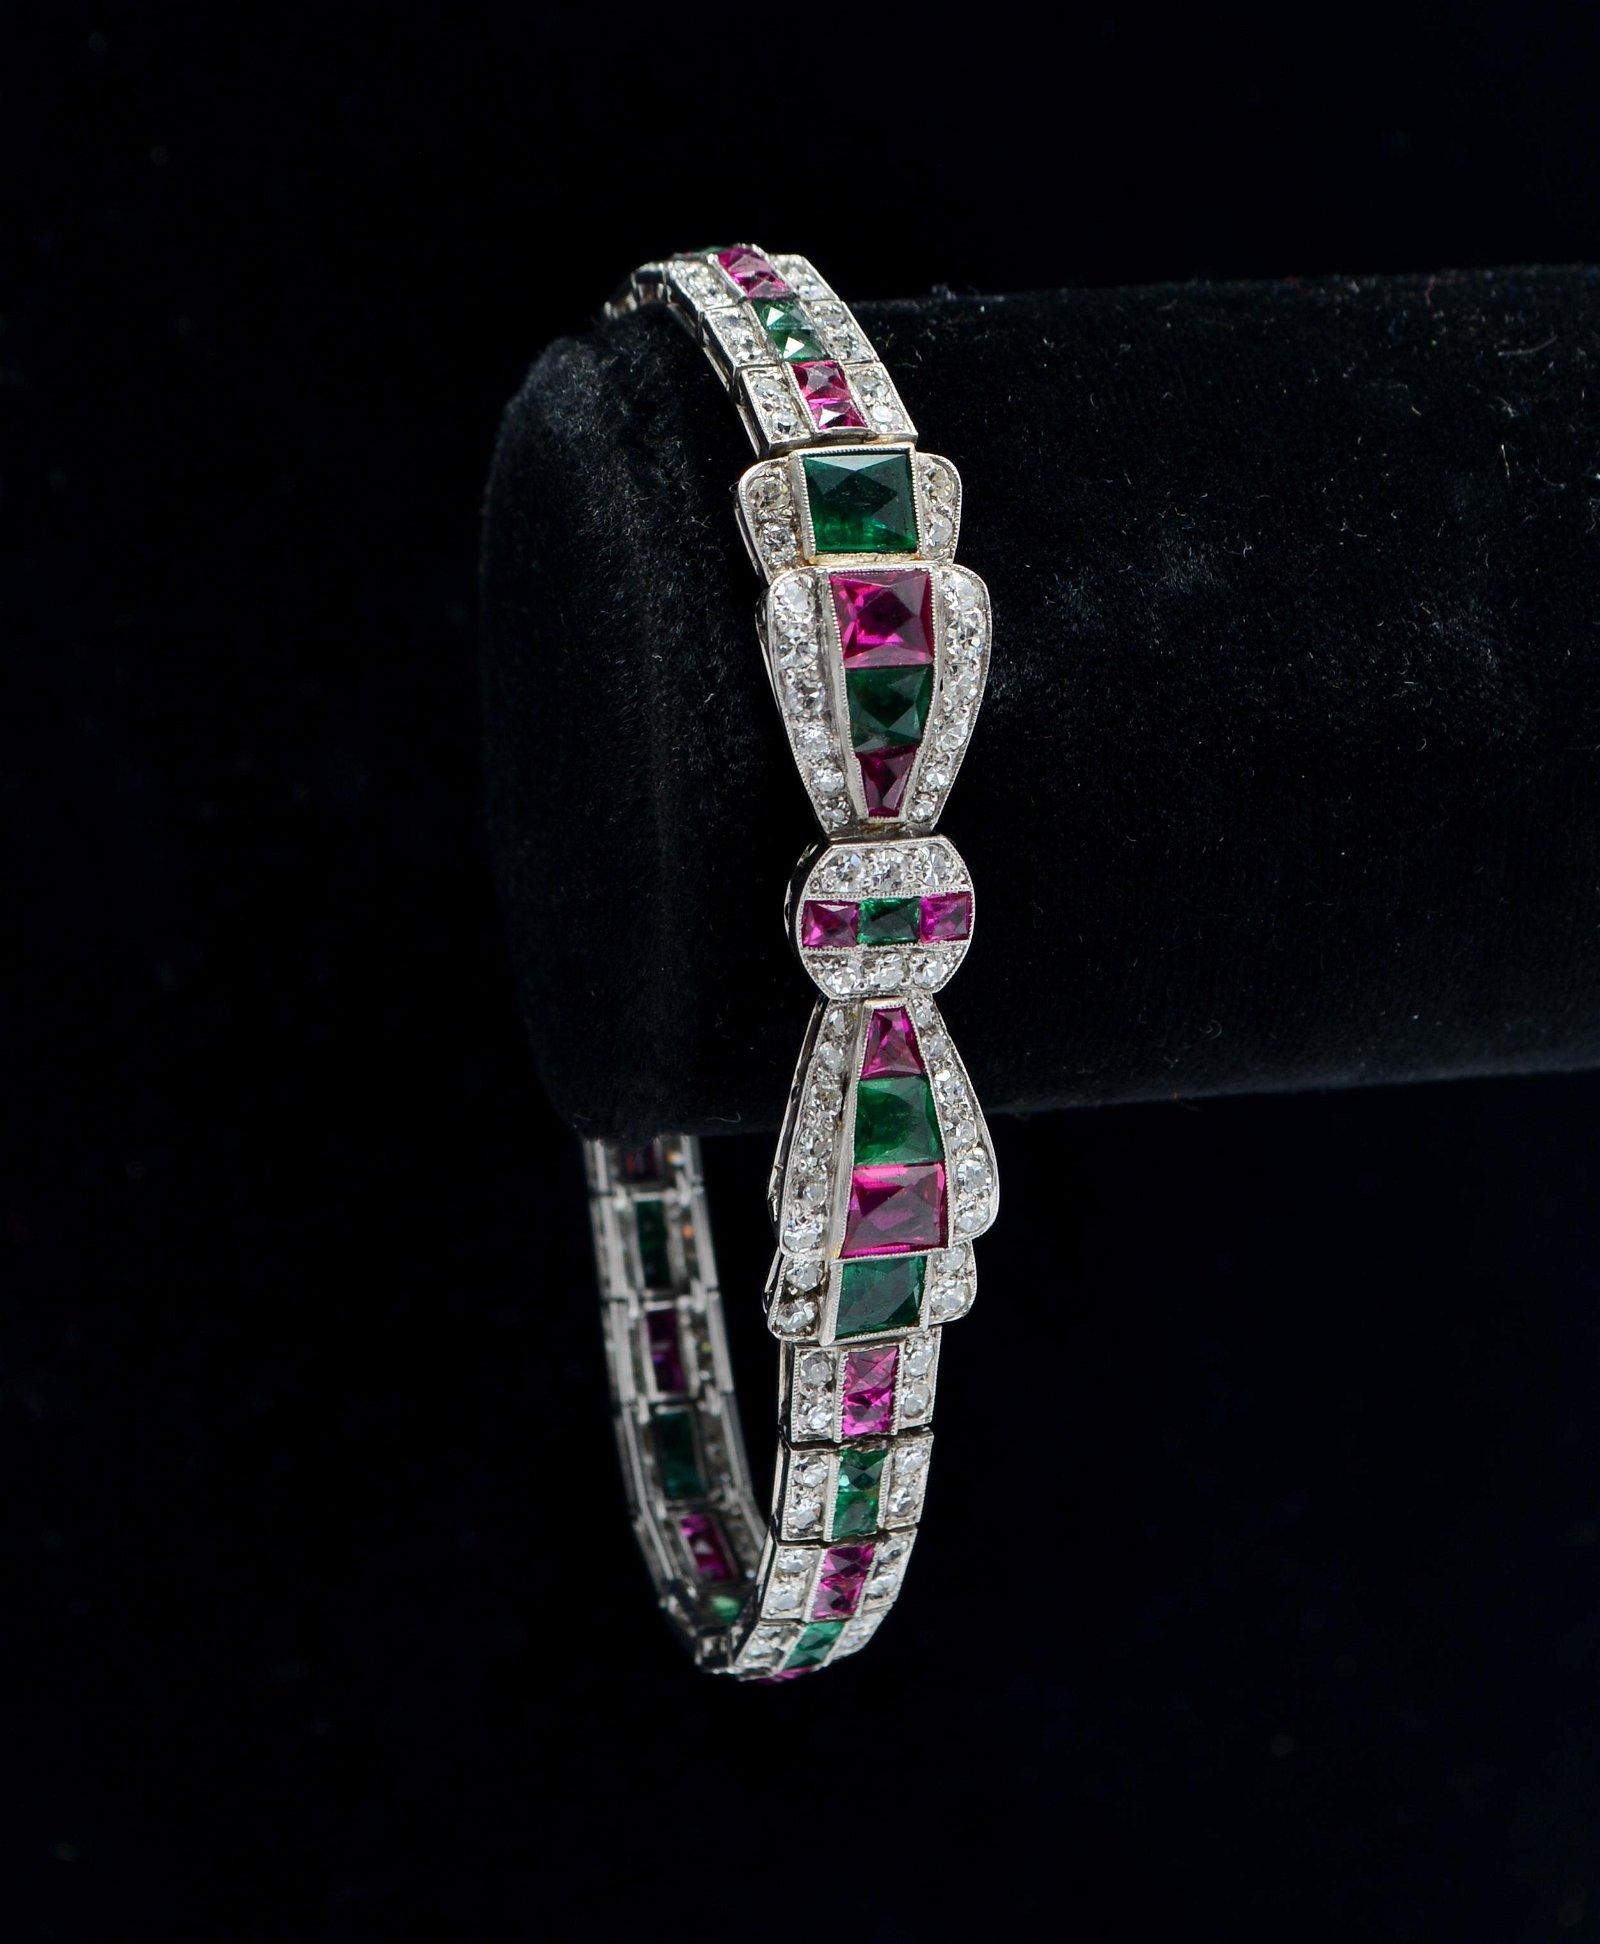 Art Deco 18K Gold Diamond Emerald & Ruby Bracelet